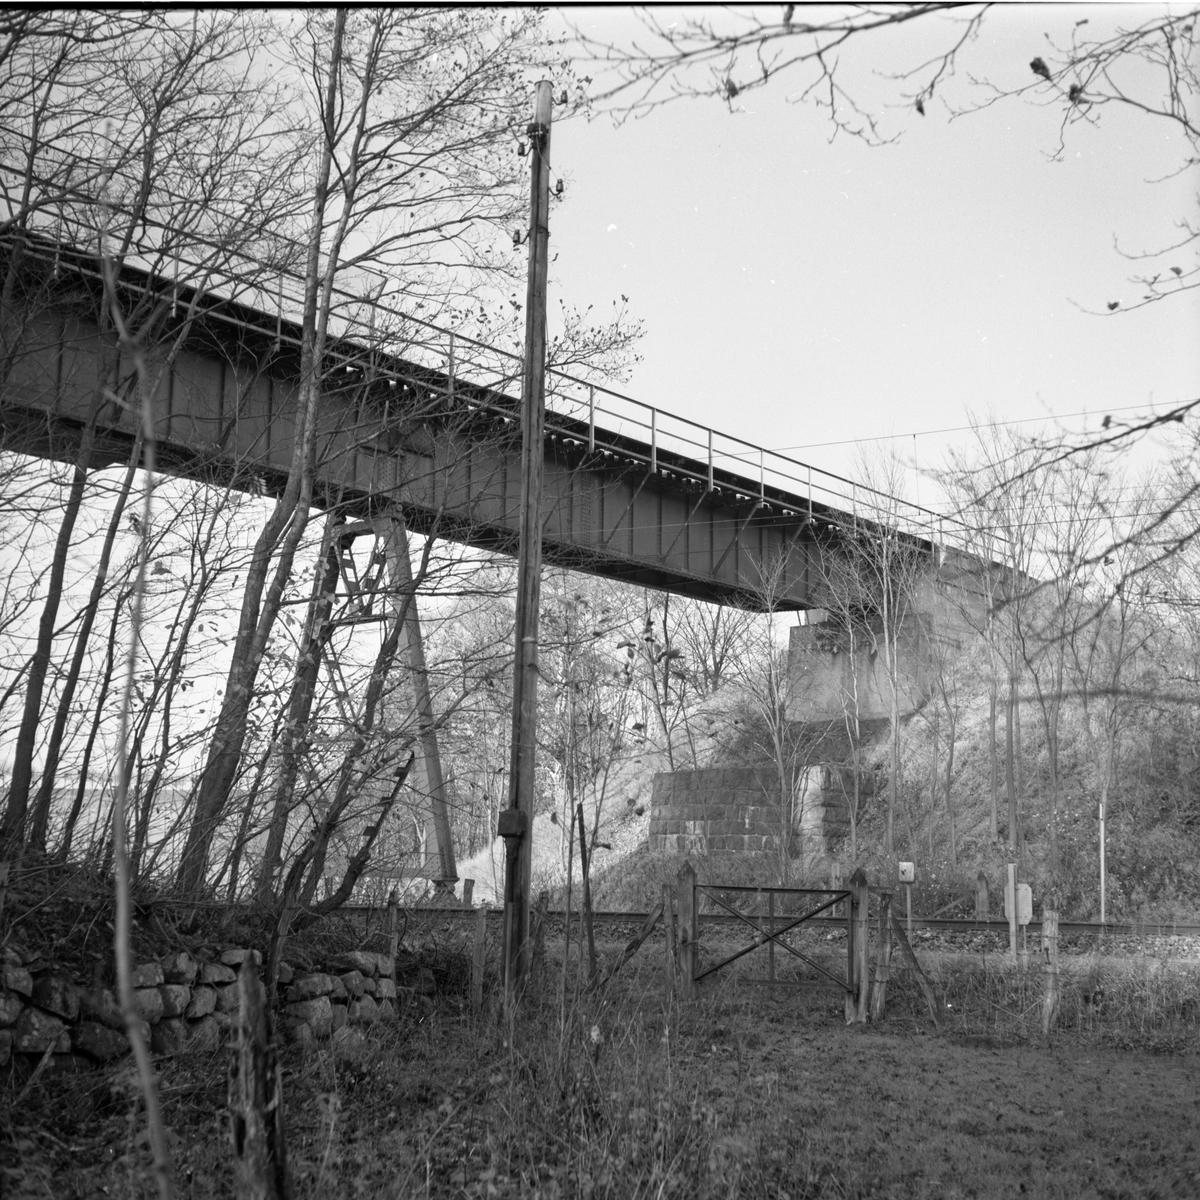 Viadukt i samband med nedläggning. Billesholm - Landskrona.